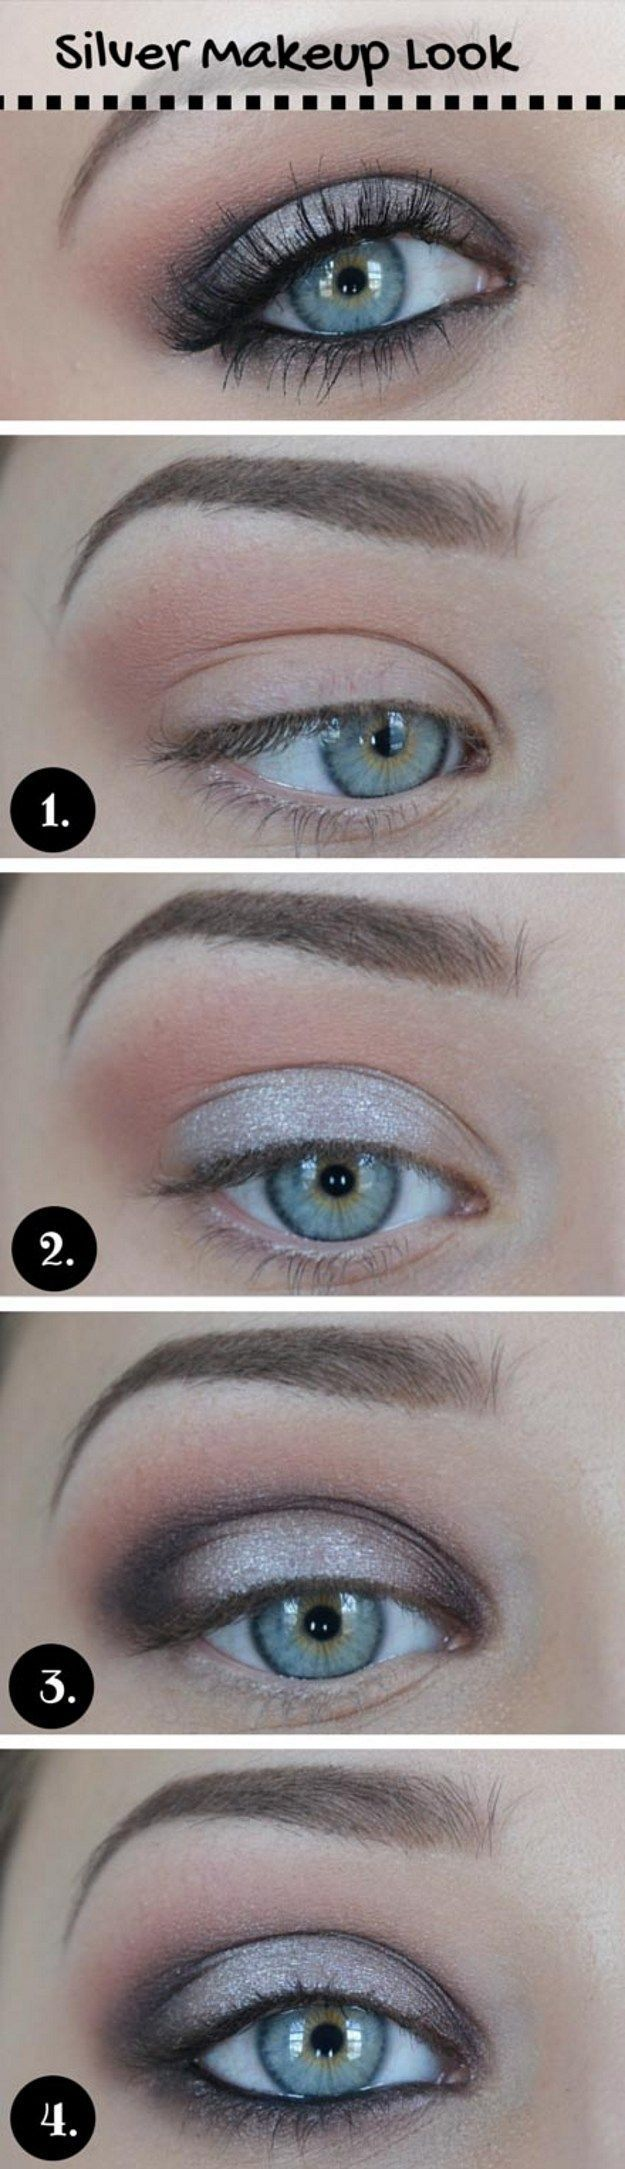 How to Do Silver Eye Makeup | Metallic Eyes by Makeup Tutorials at www.makeuptut...